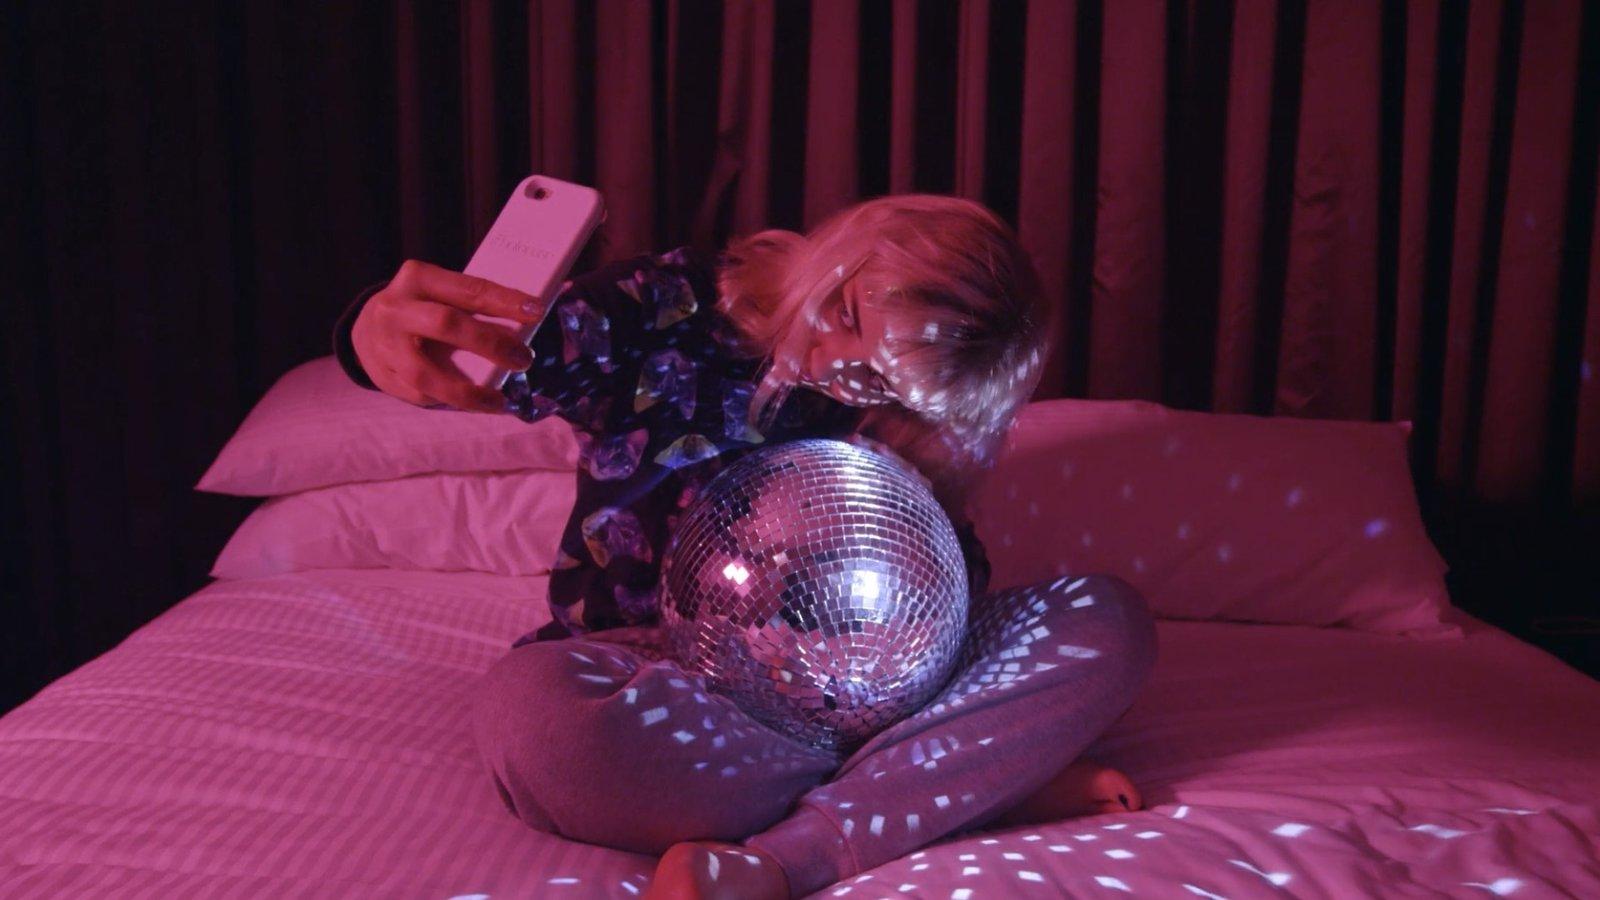 The Glass Bedroom: Carolyn Duchene - Episode 5